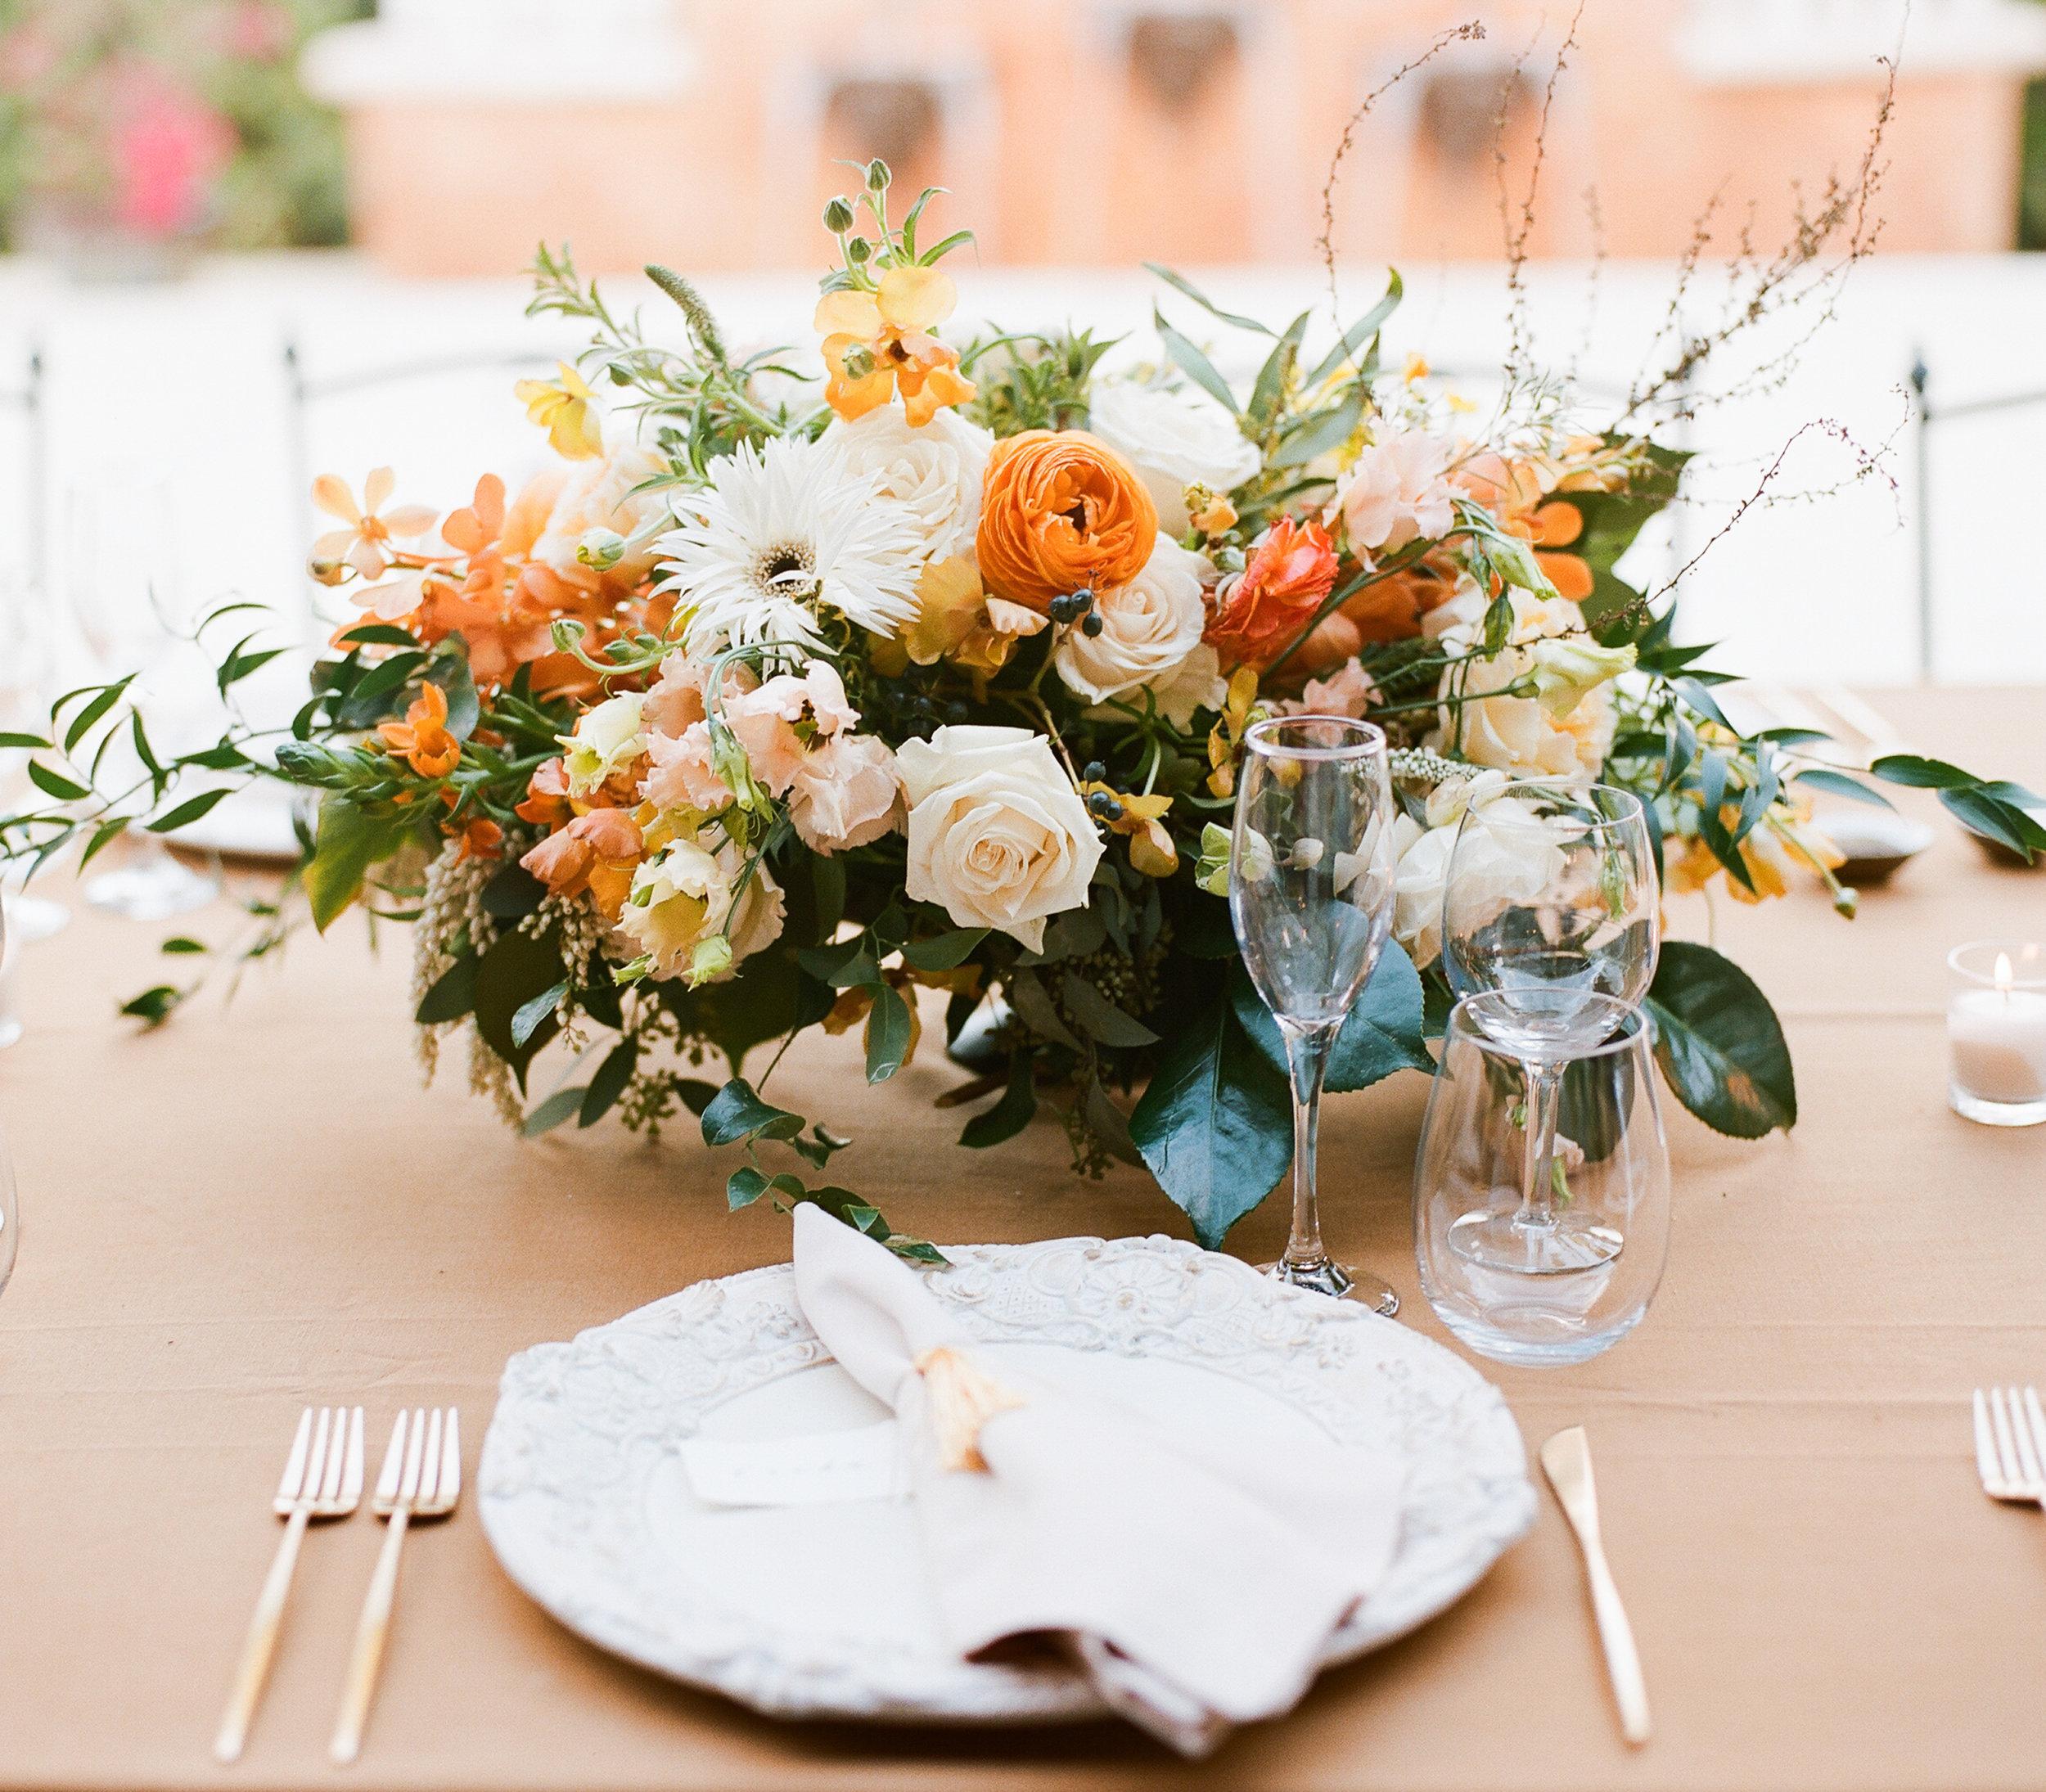 43-roxanne-bellamy-wedding.jpg